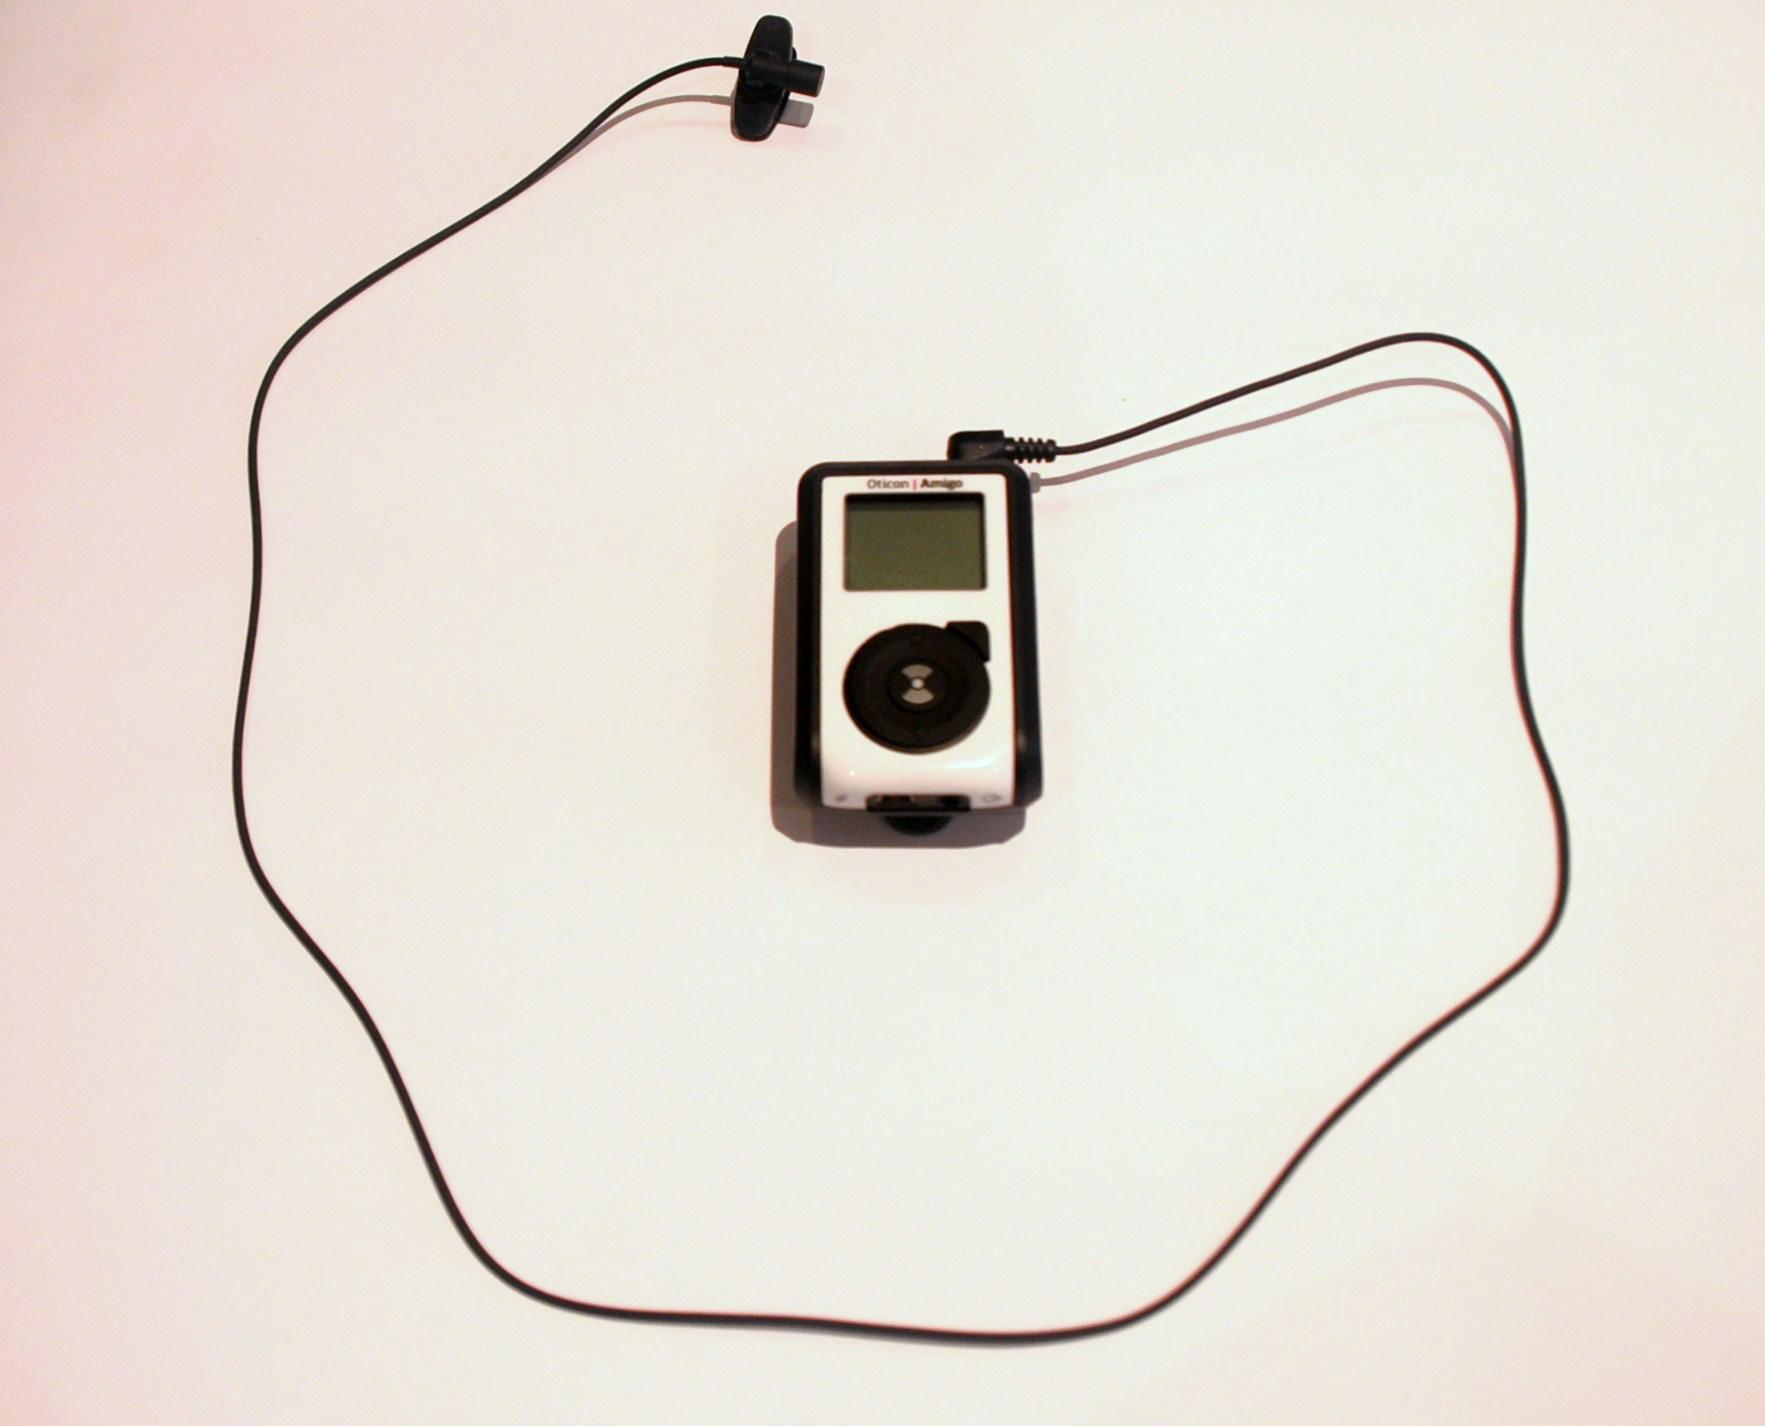 sistema fm con microfono en solapa